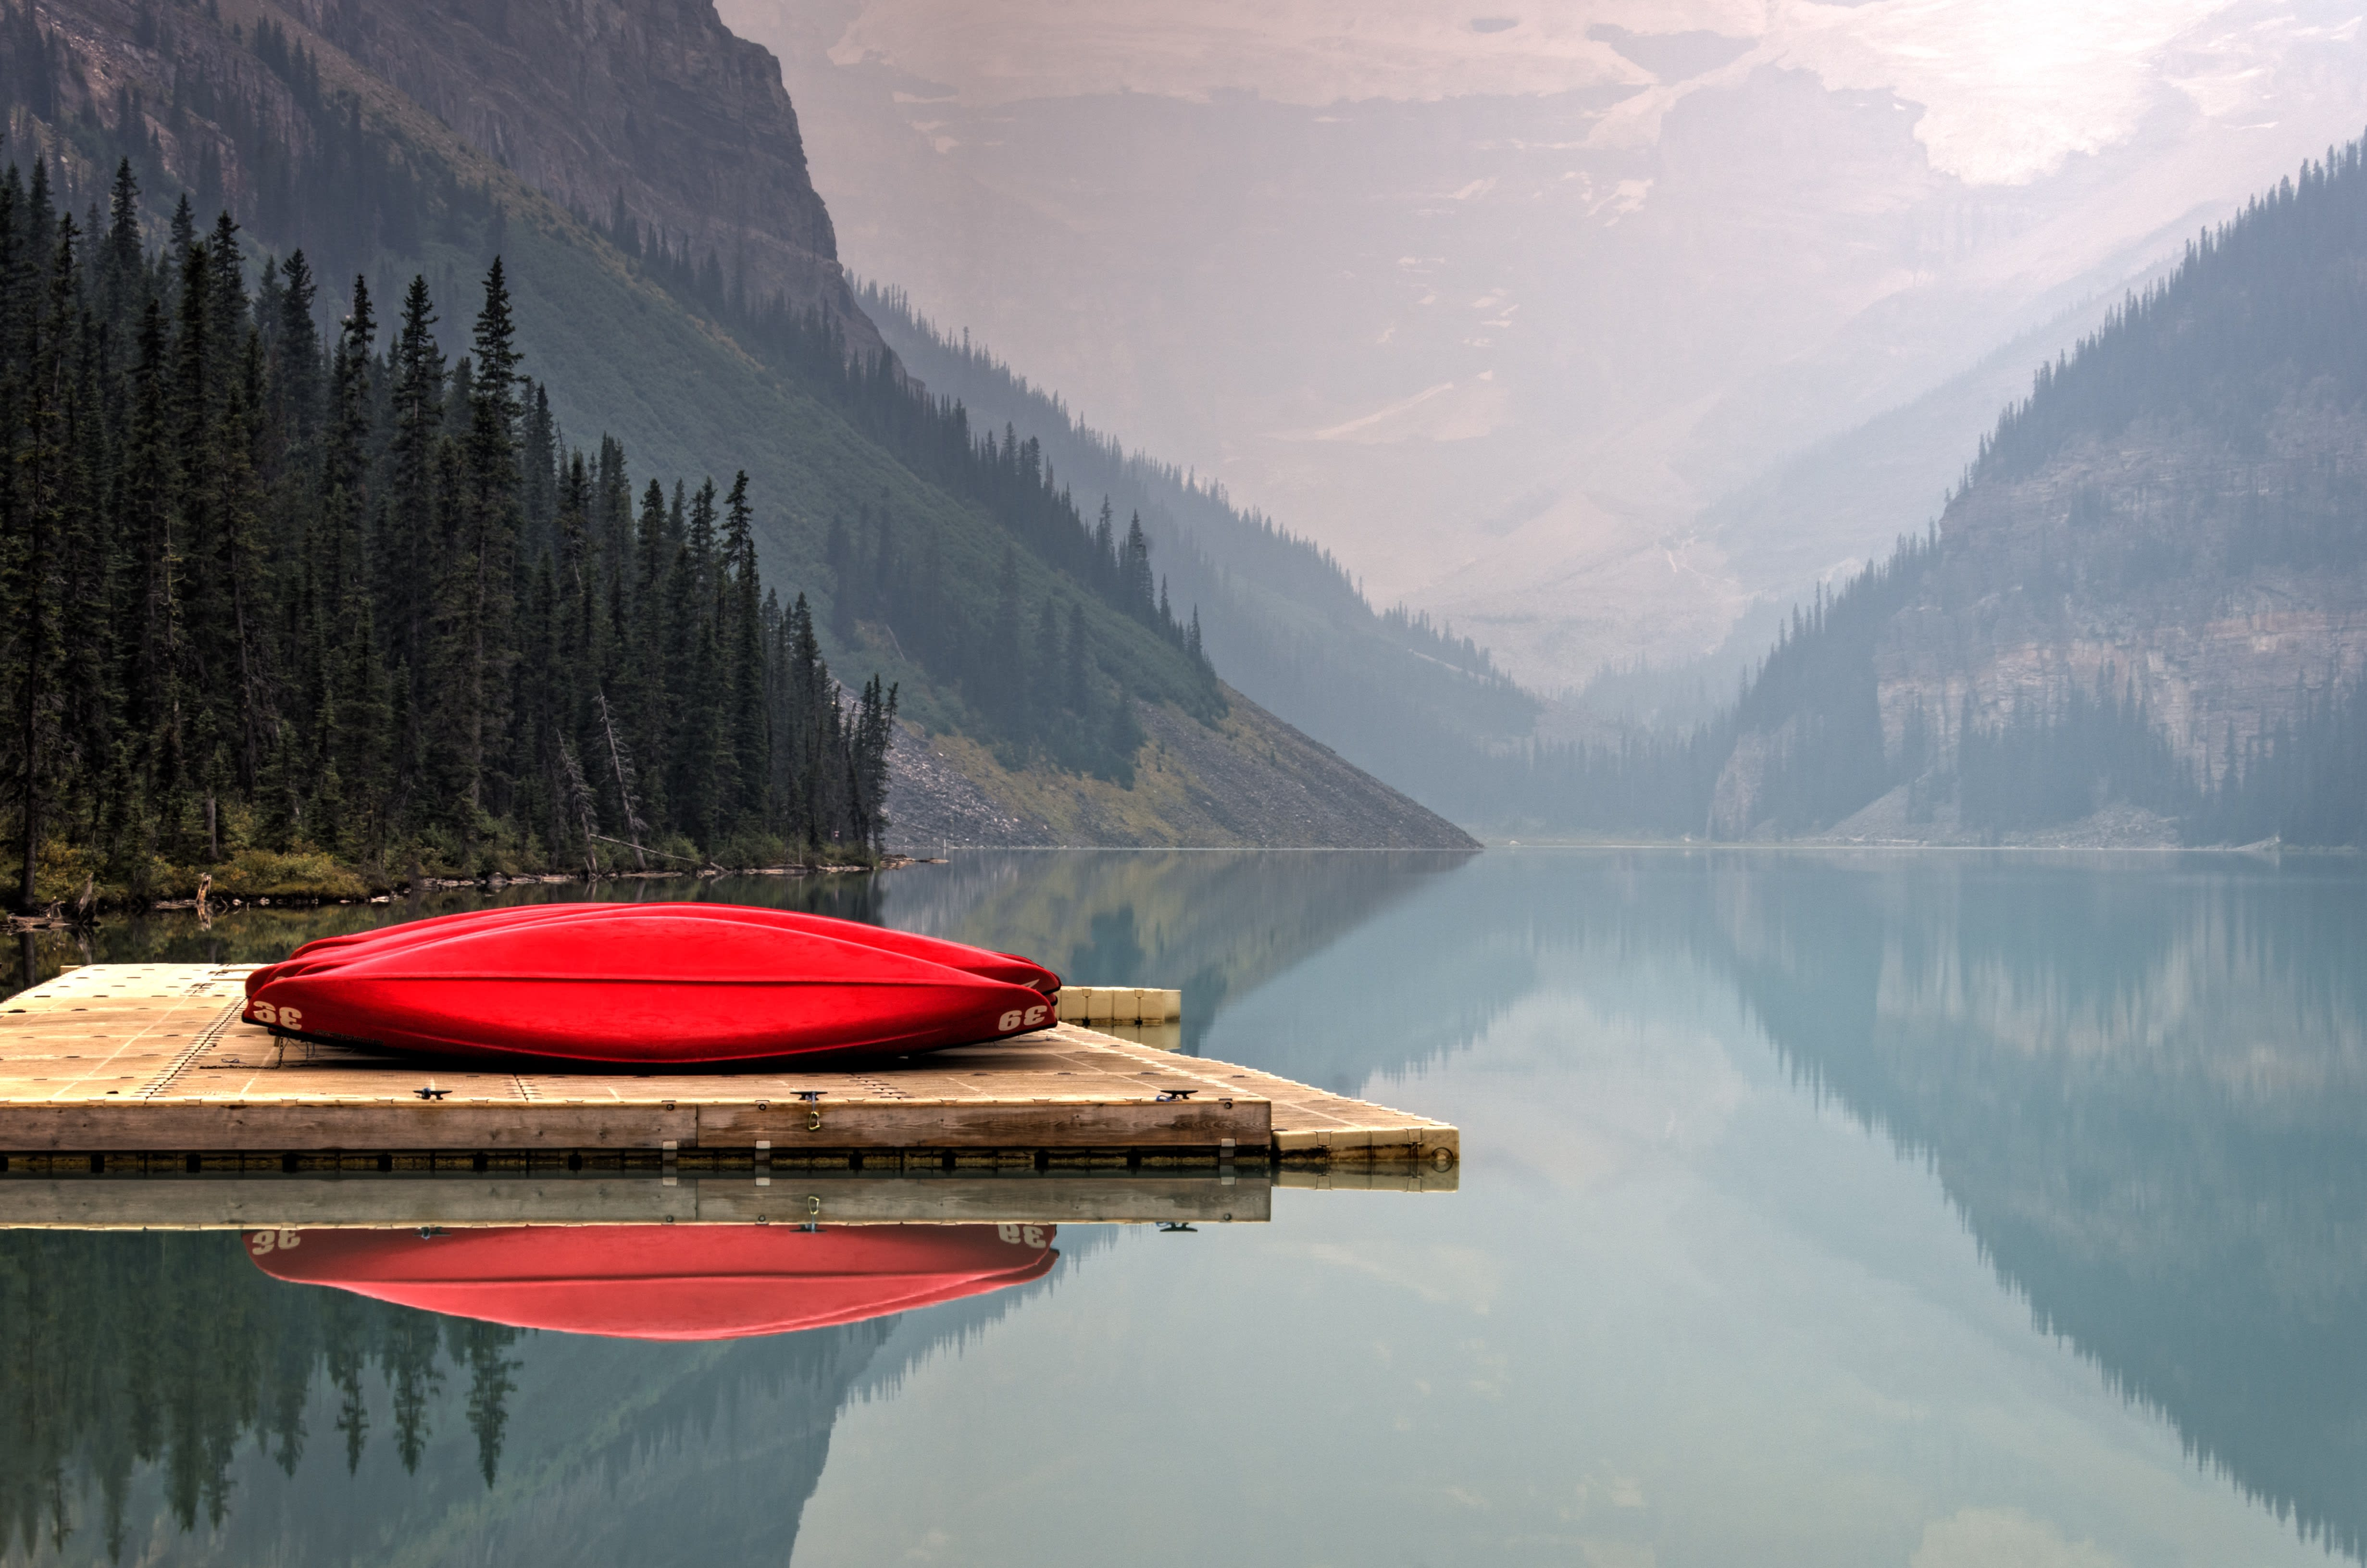 Canoe on dock by a calm mountain lake.